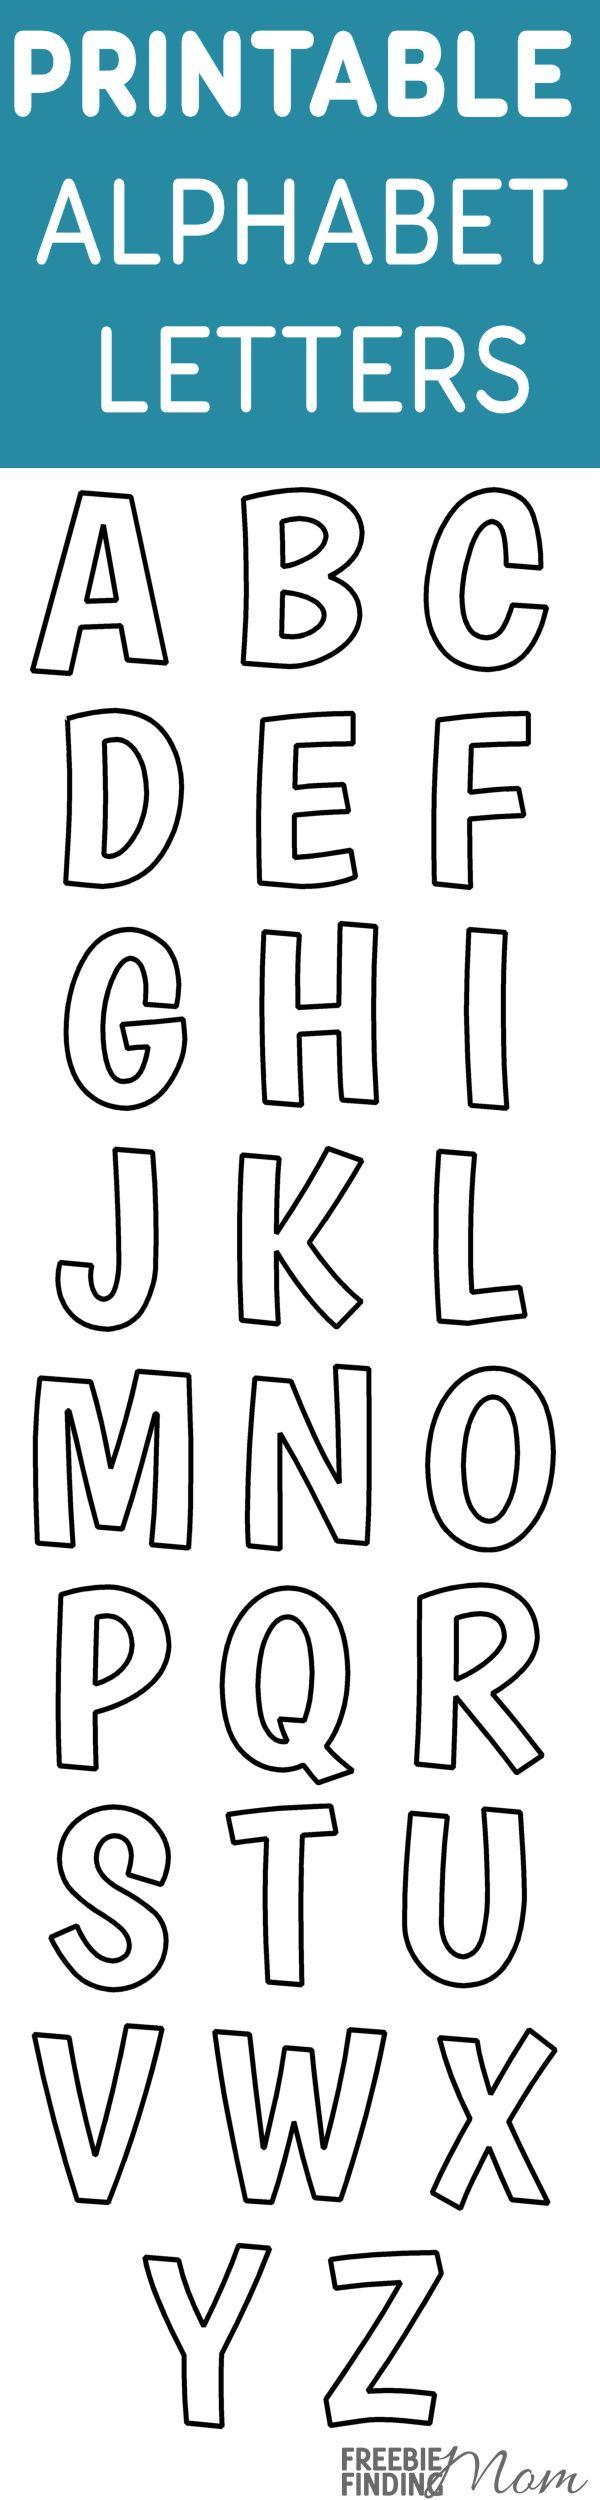 Printable free alphabet templates alphabet templates free printable free alphabet templates alphabet templates free printables and homeschool spiritdancerdesigns Choice Image